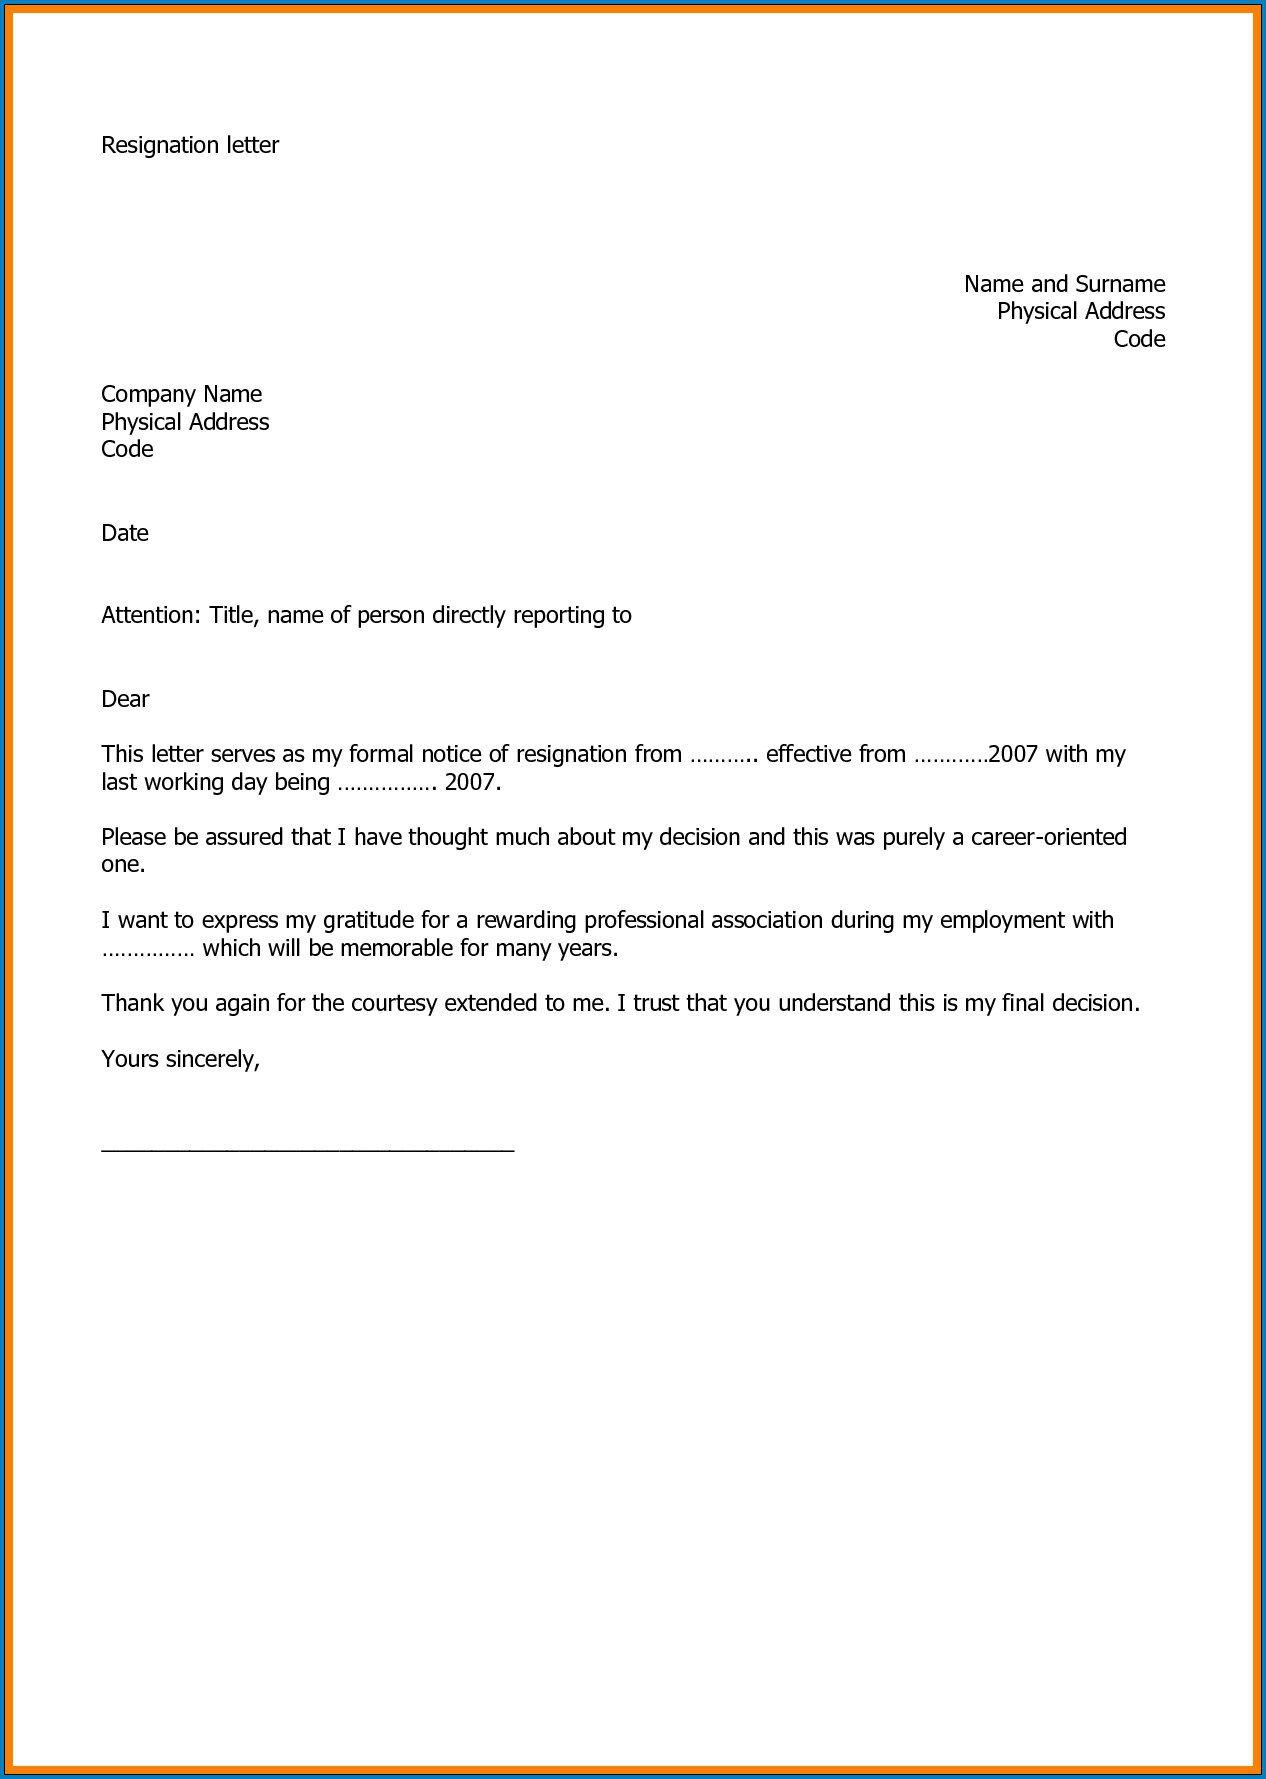 005 Stirring Resignation Letter Template Word High Def  Malaysia UkFull